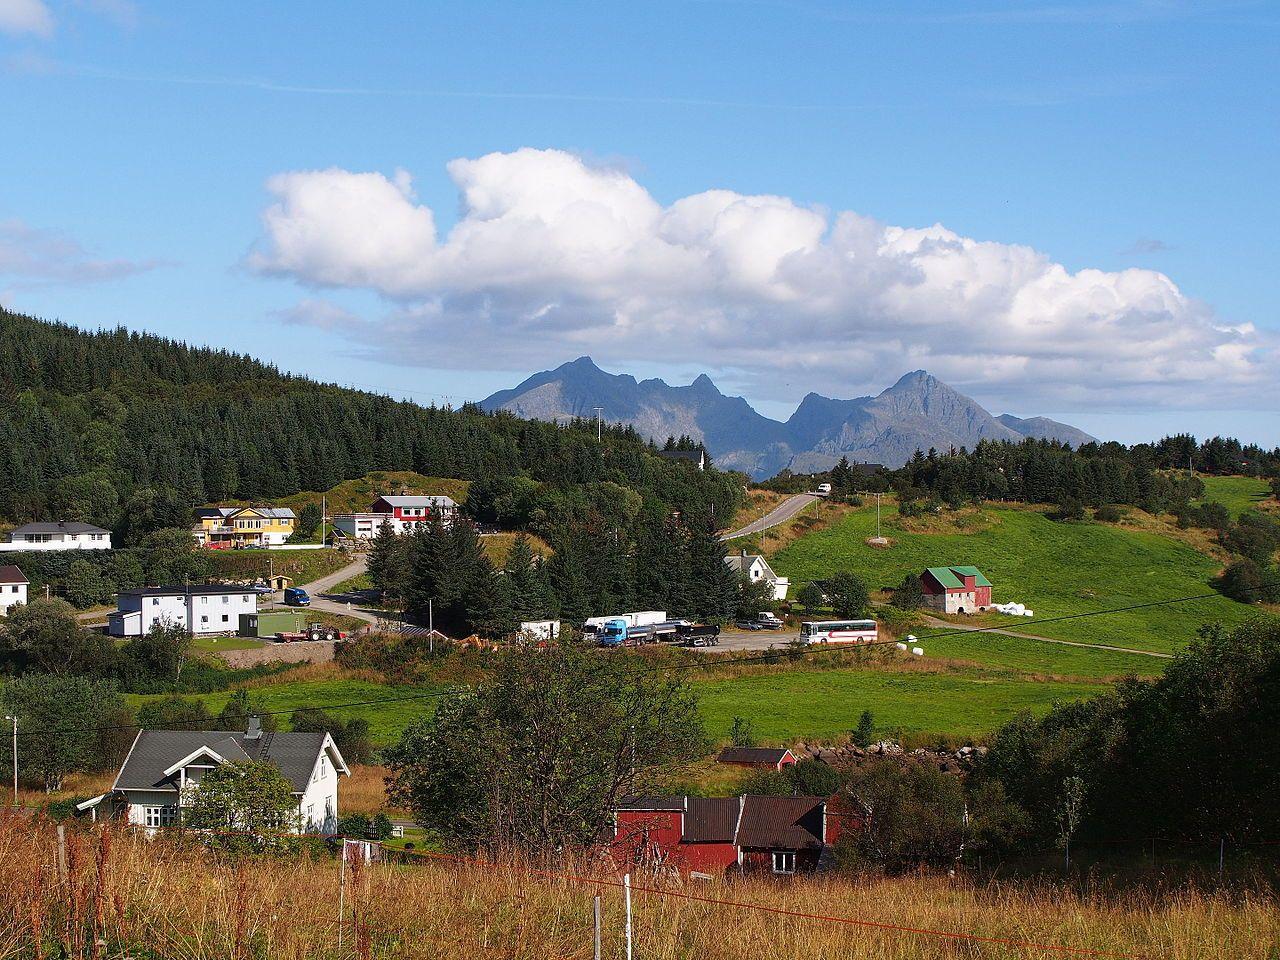 Paisagem norueguesa, vendo-se a Rodovia 818, para Ballstad, no município de Vestvågøy, arquipélago de Lofoten, condado de Nordland, Noruega.  Fotografia: Rheins.